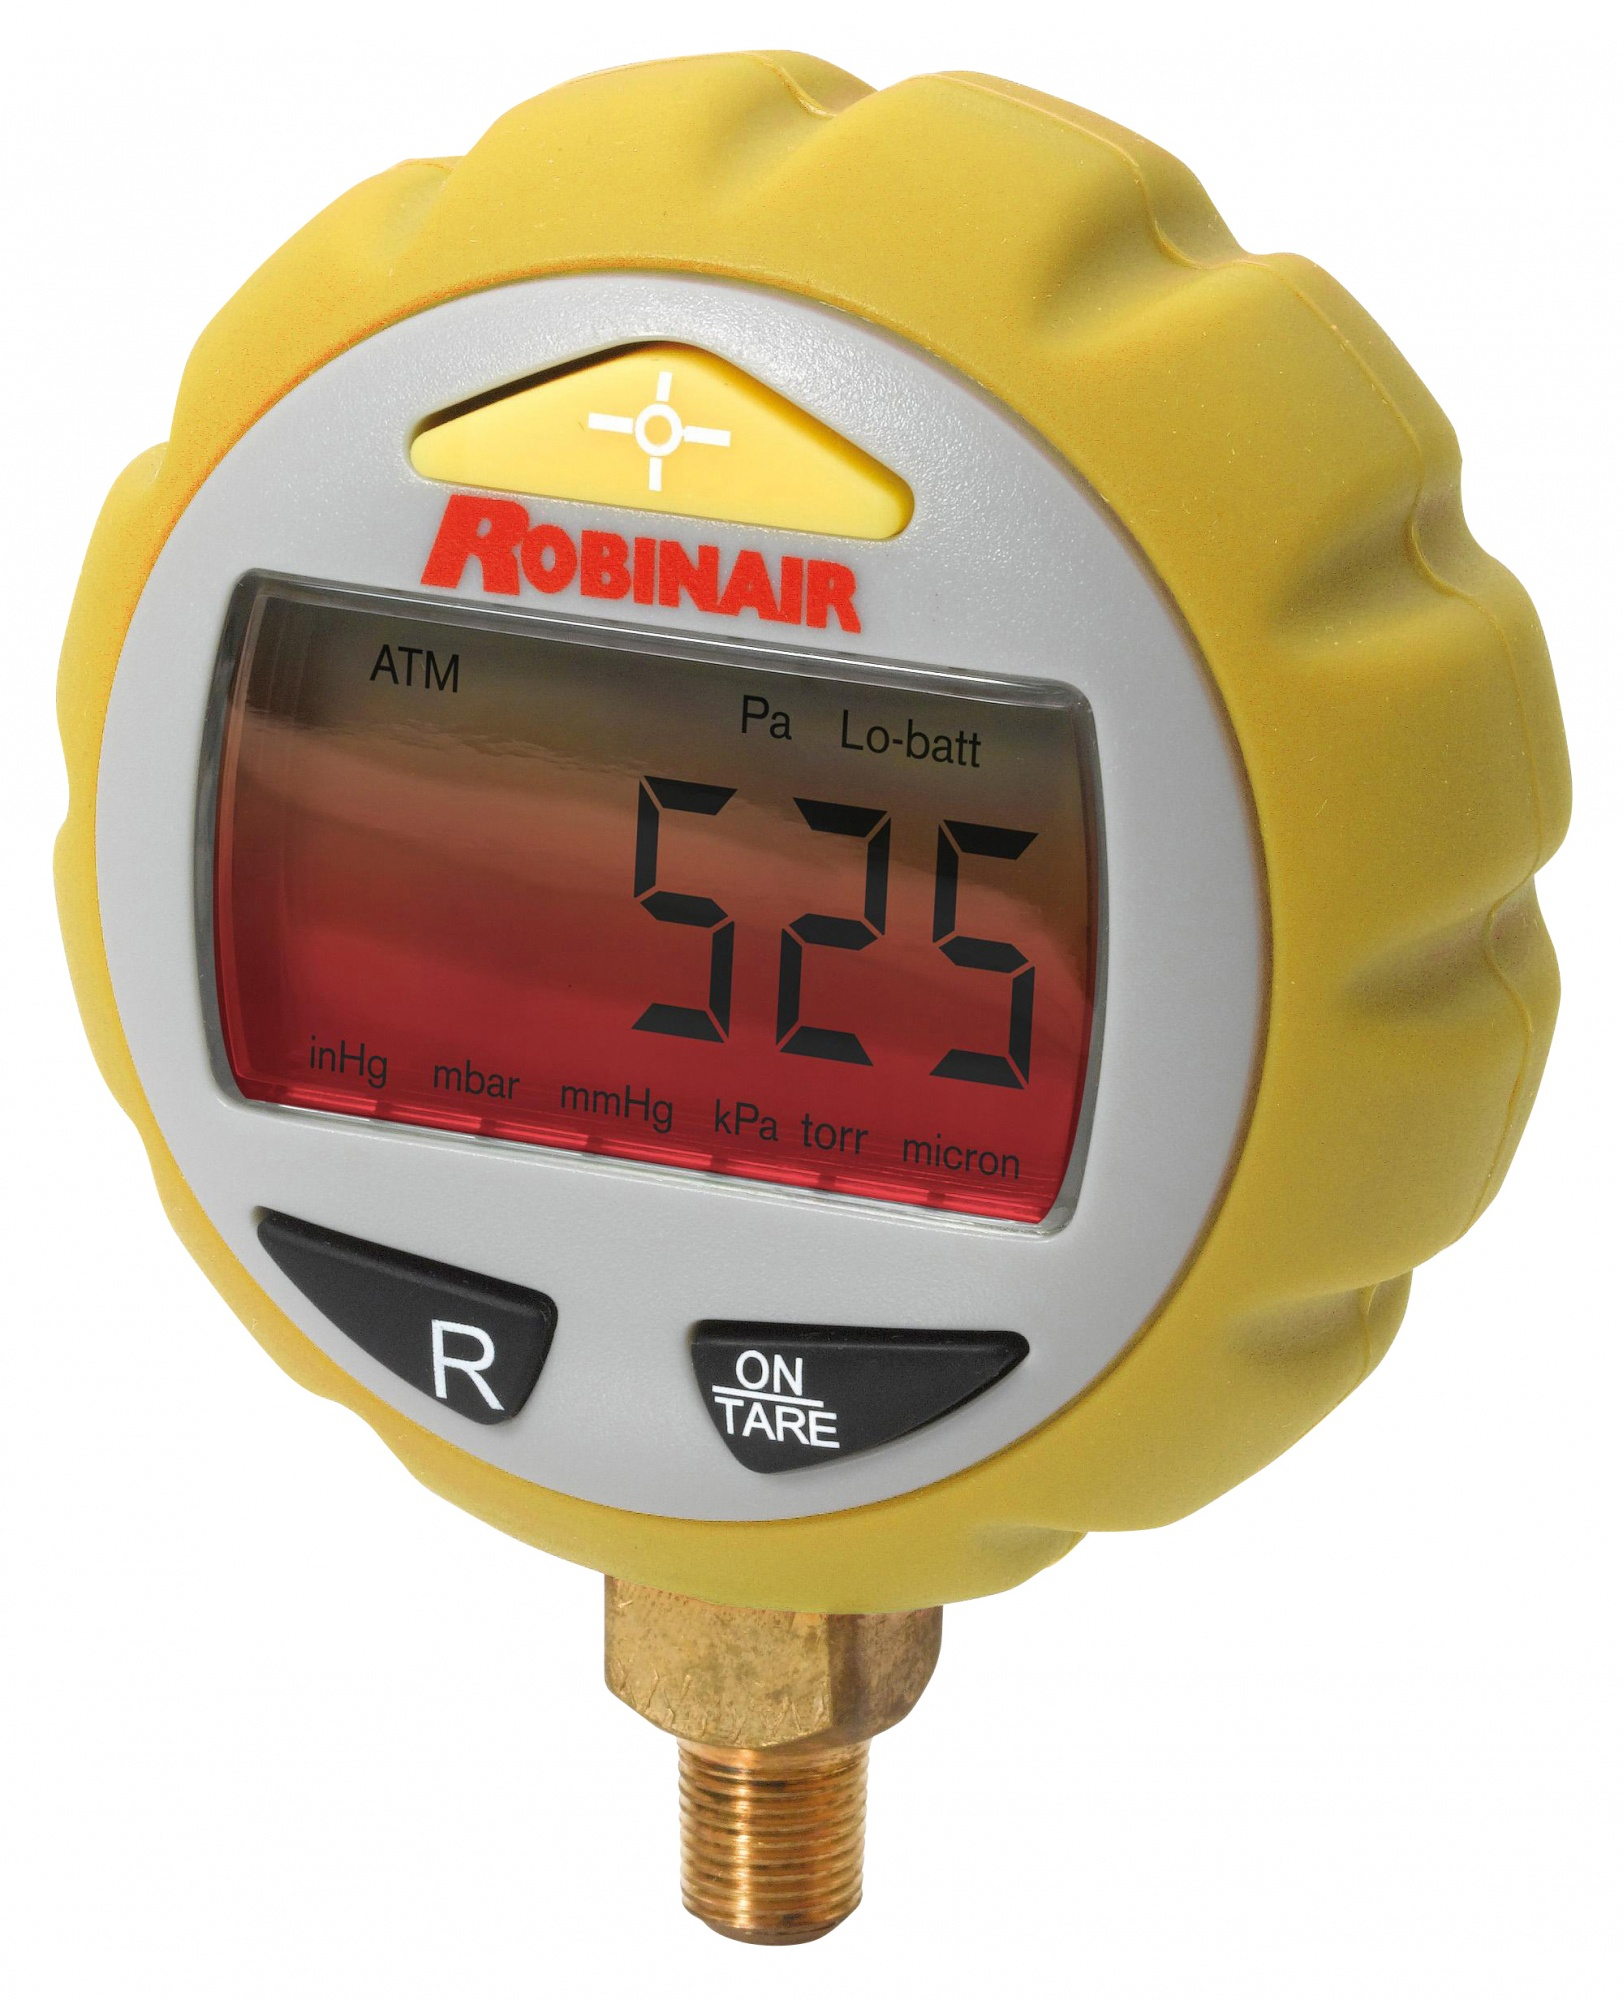 Robinair TIF785 Phototachometer